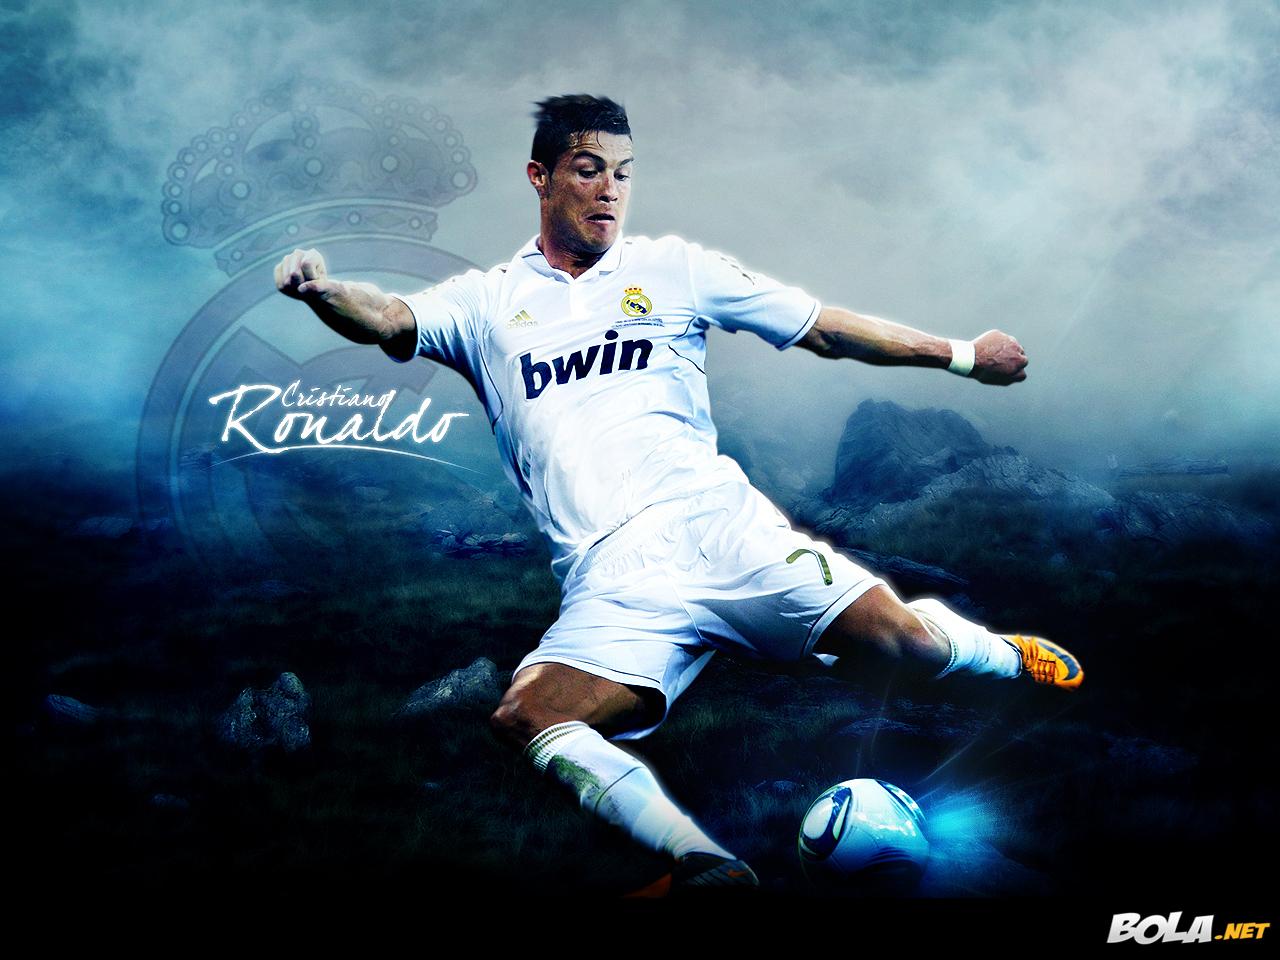 http://1.bp.blogspot.com/-8iYhhx_W3CY/UGQcKE92KQI/AAAAAAAAHMs/cC6LU4-eWMA/s1600/Cristiano-Ronaldo-2012-wallpaper-5.jpg